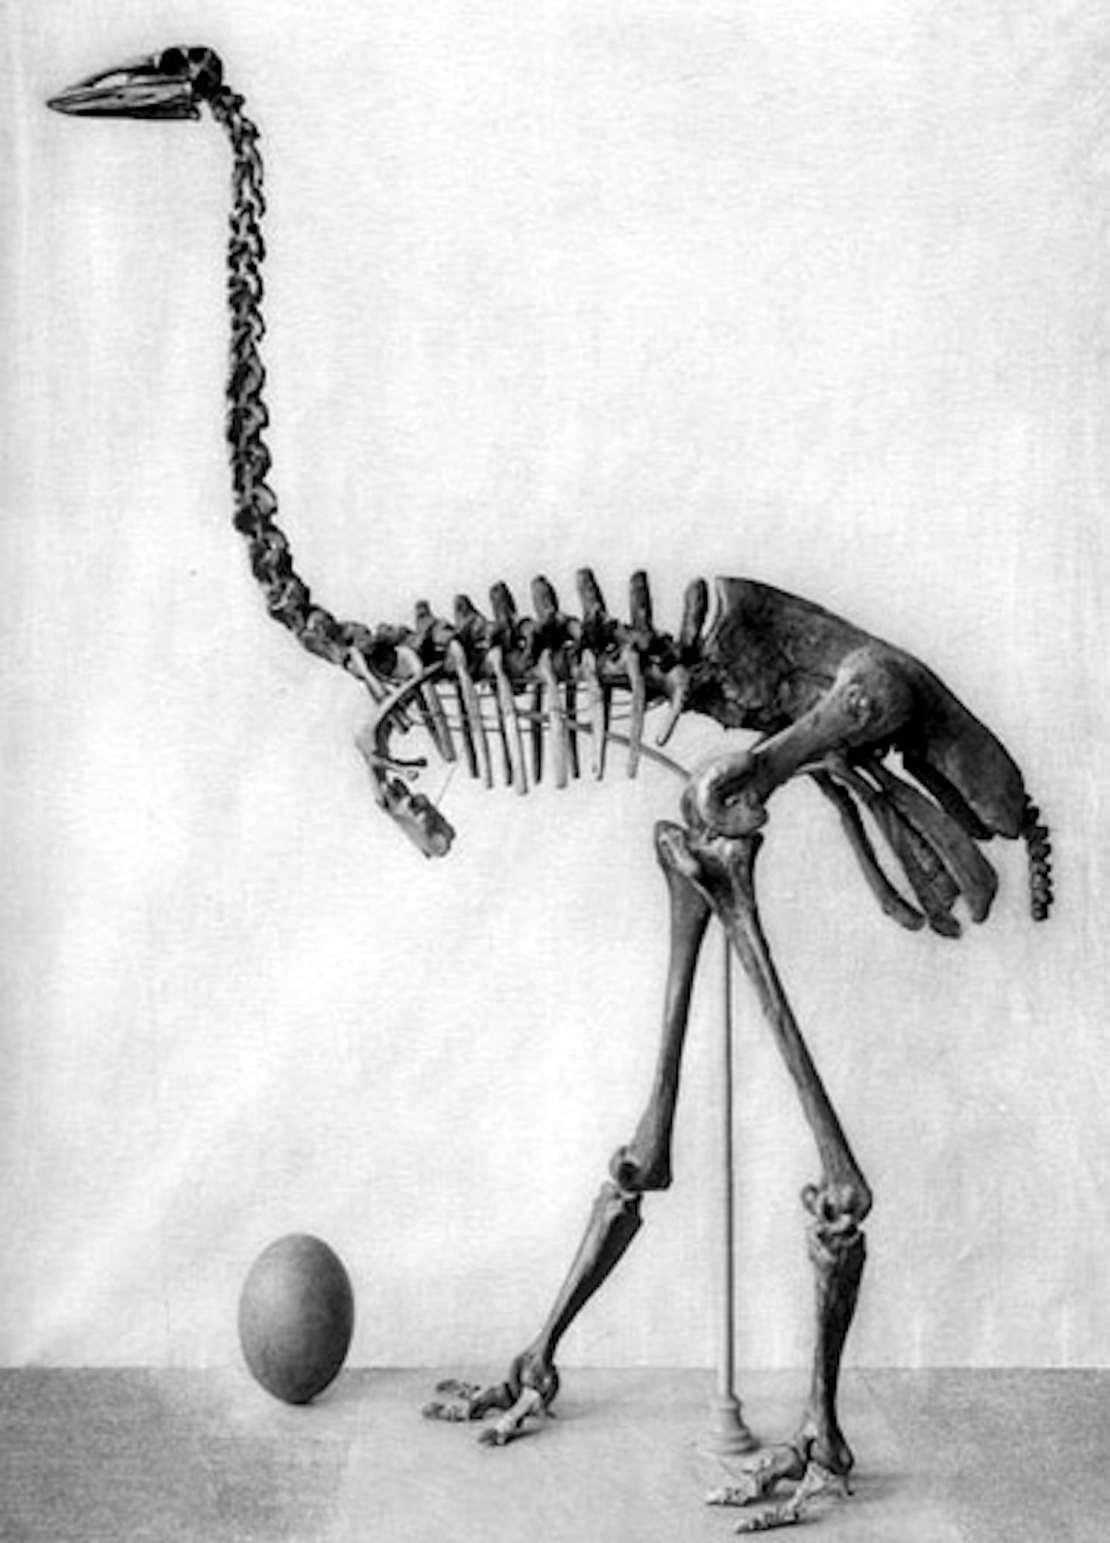 Skeleton of a large bird, black and white image